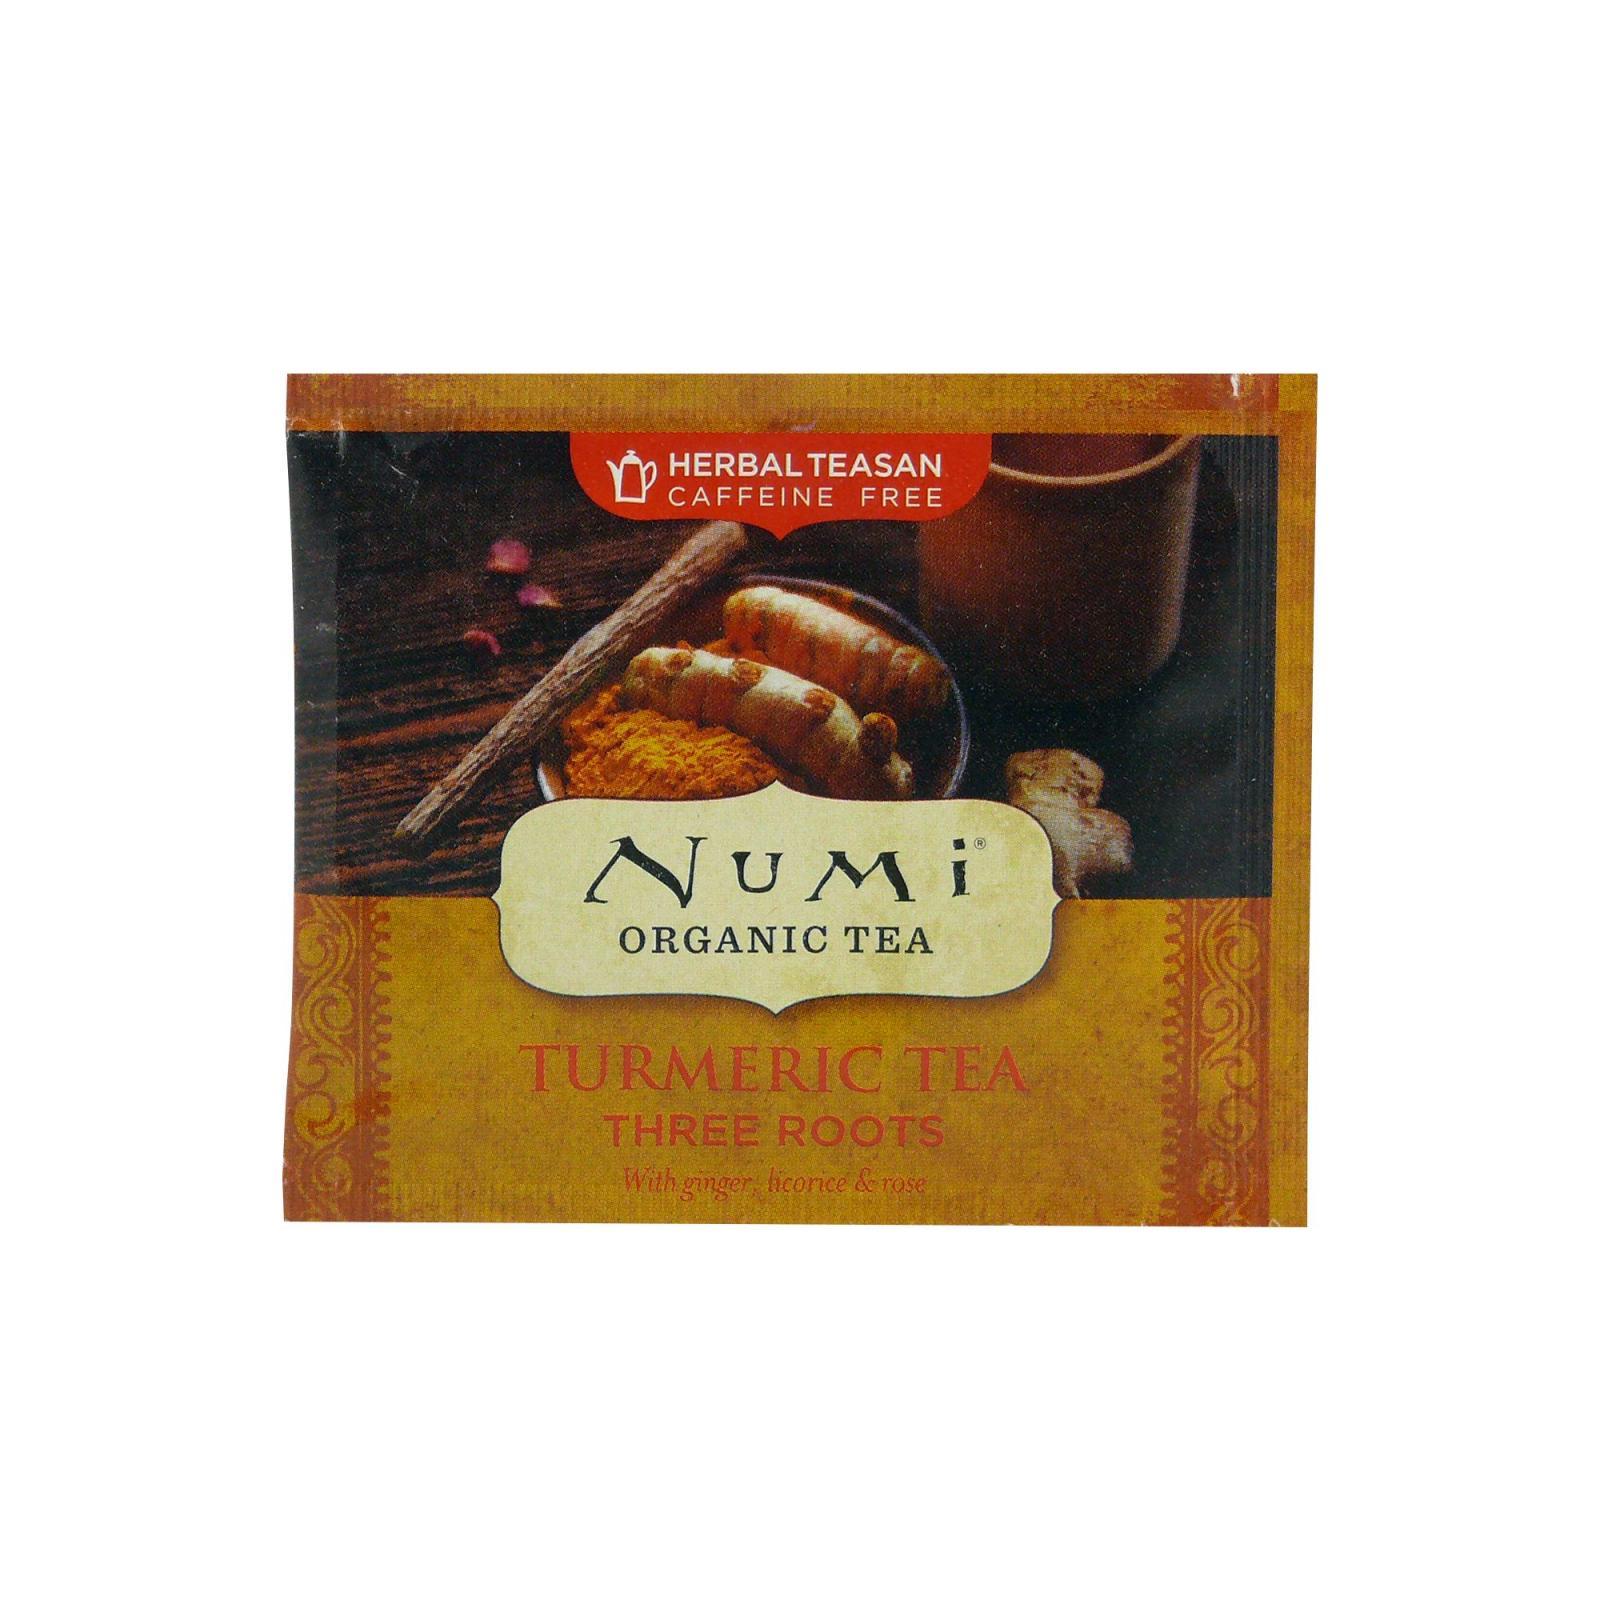 Numi Organic Tea Kořeněný čaj Three Roots, Turmeric Tea 3,35 g, 1 ks